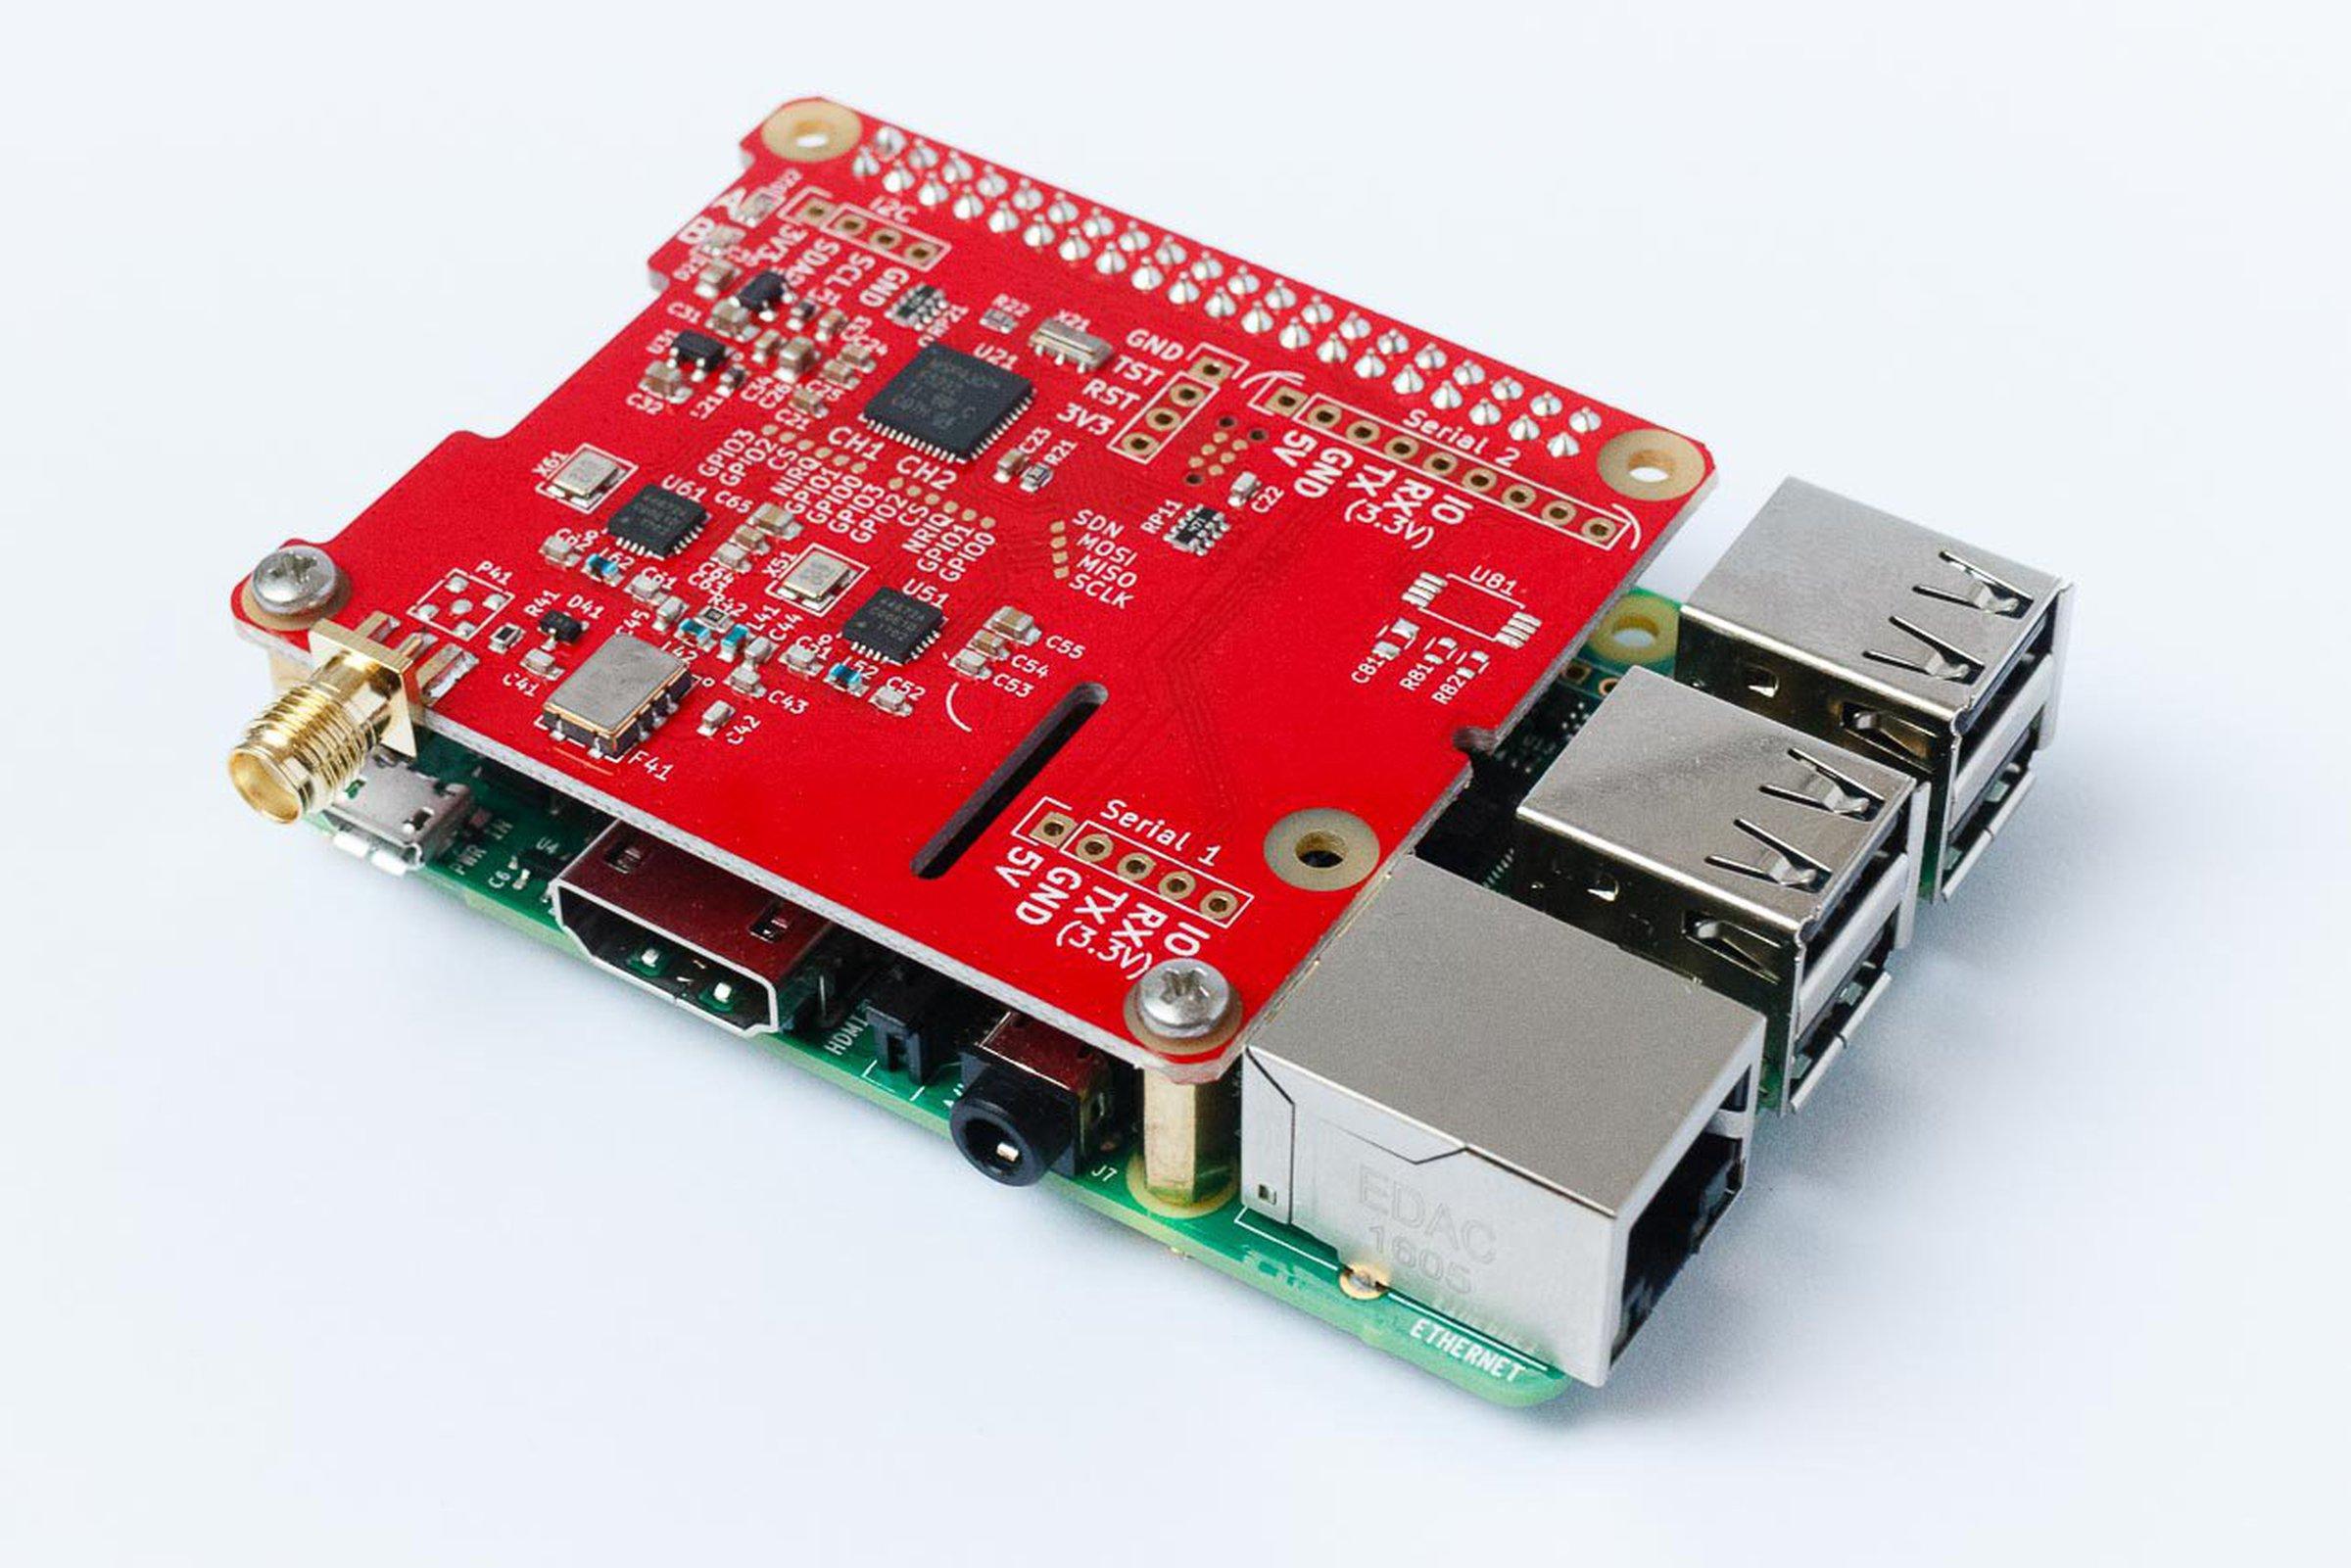 Daisy Hat Ais Receiver For Raspberry Pi From Wegmatt Llc On Tindie 433 Mhz Circuit Autos Post 2